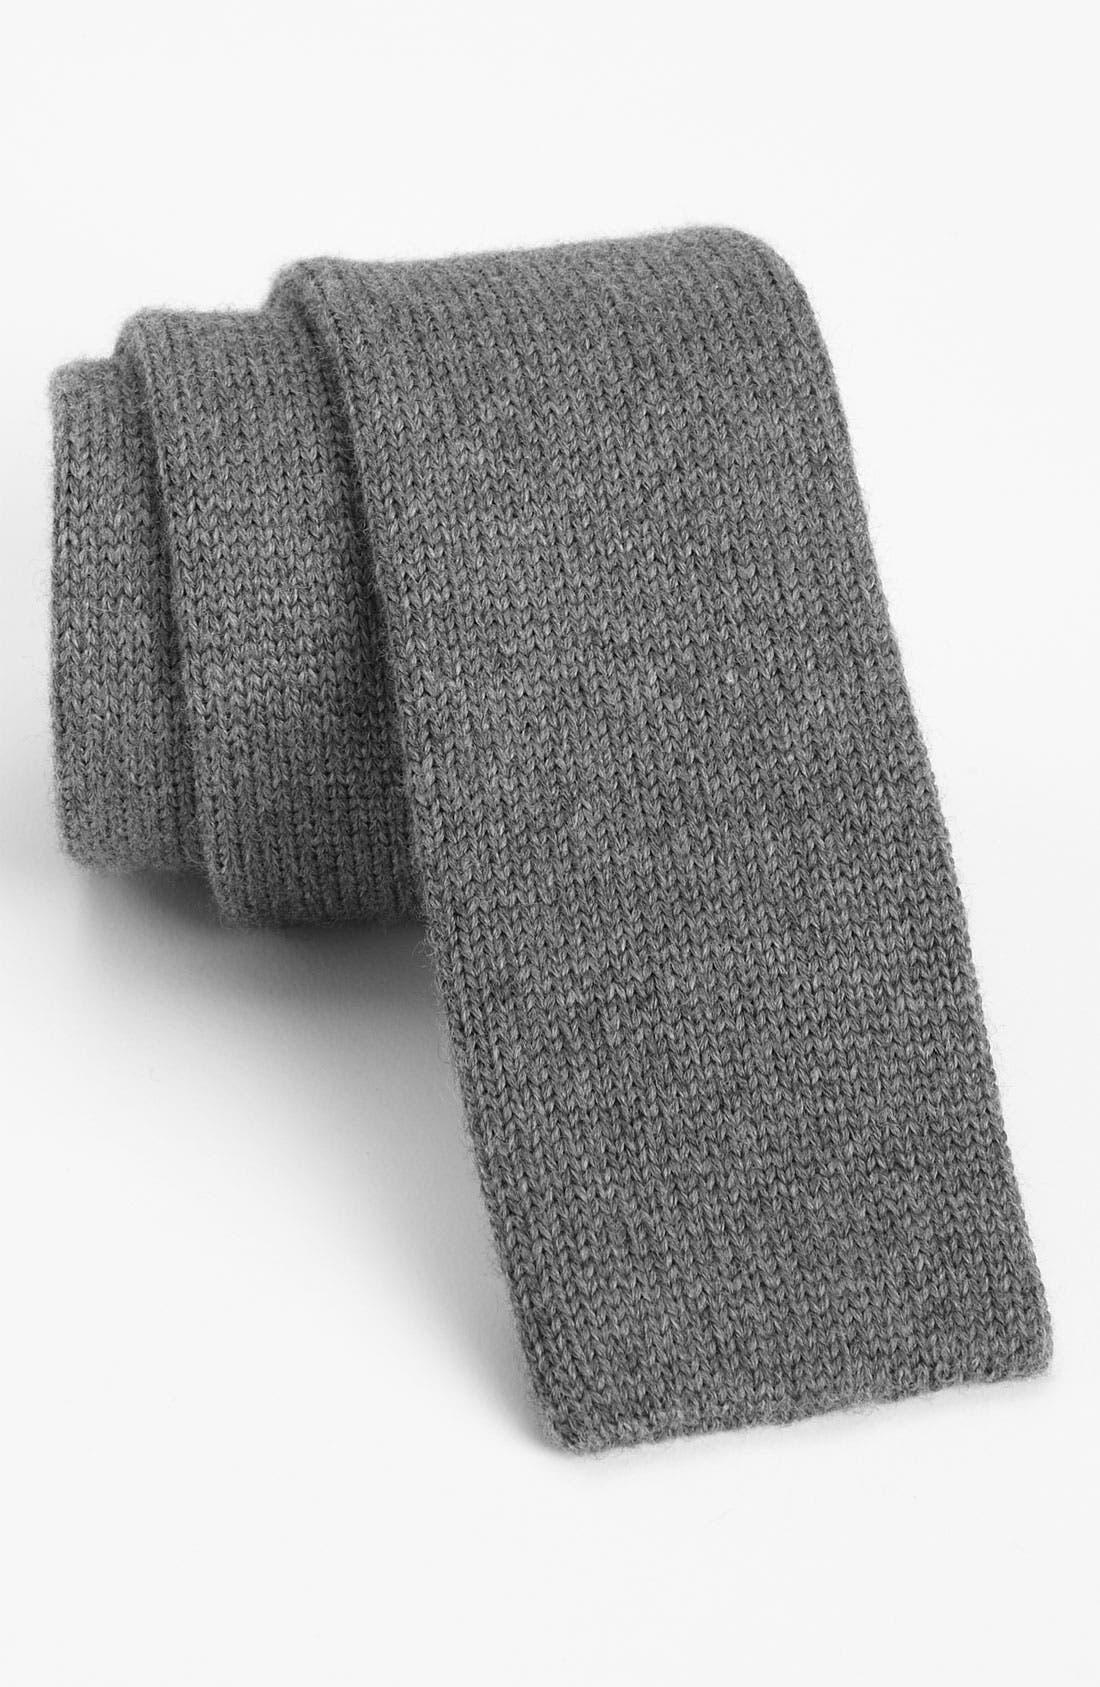 Alternate Image 1 Selected - BOSS Black Knit Tie